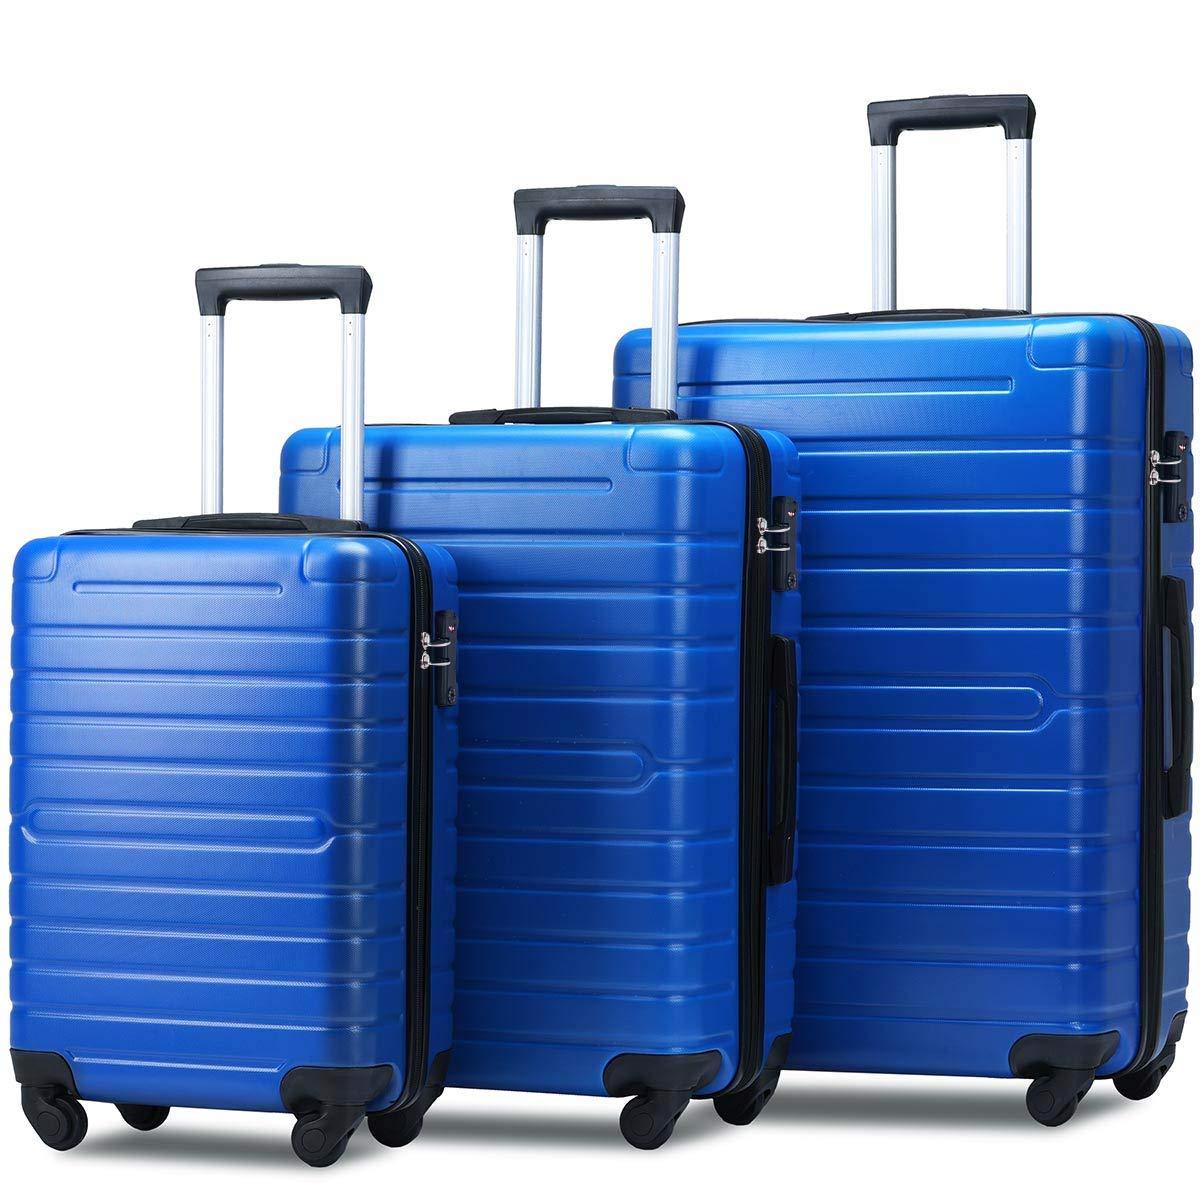 Flieks Luggage Set 3 Piece with TSA Lock Light Weight Hardside Spinner Suitcase (blue) by Merax